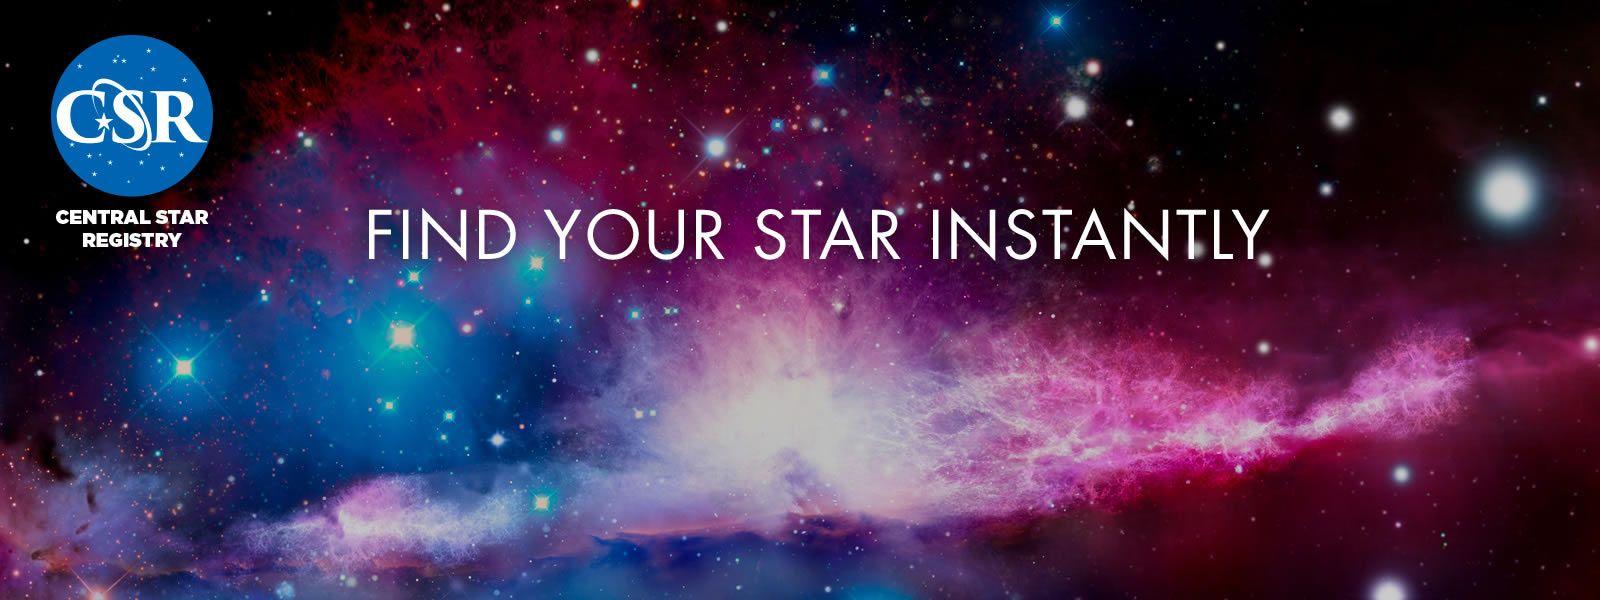 Name a Star, Buy a Star, International Star Registry, How